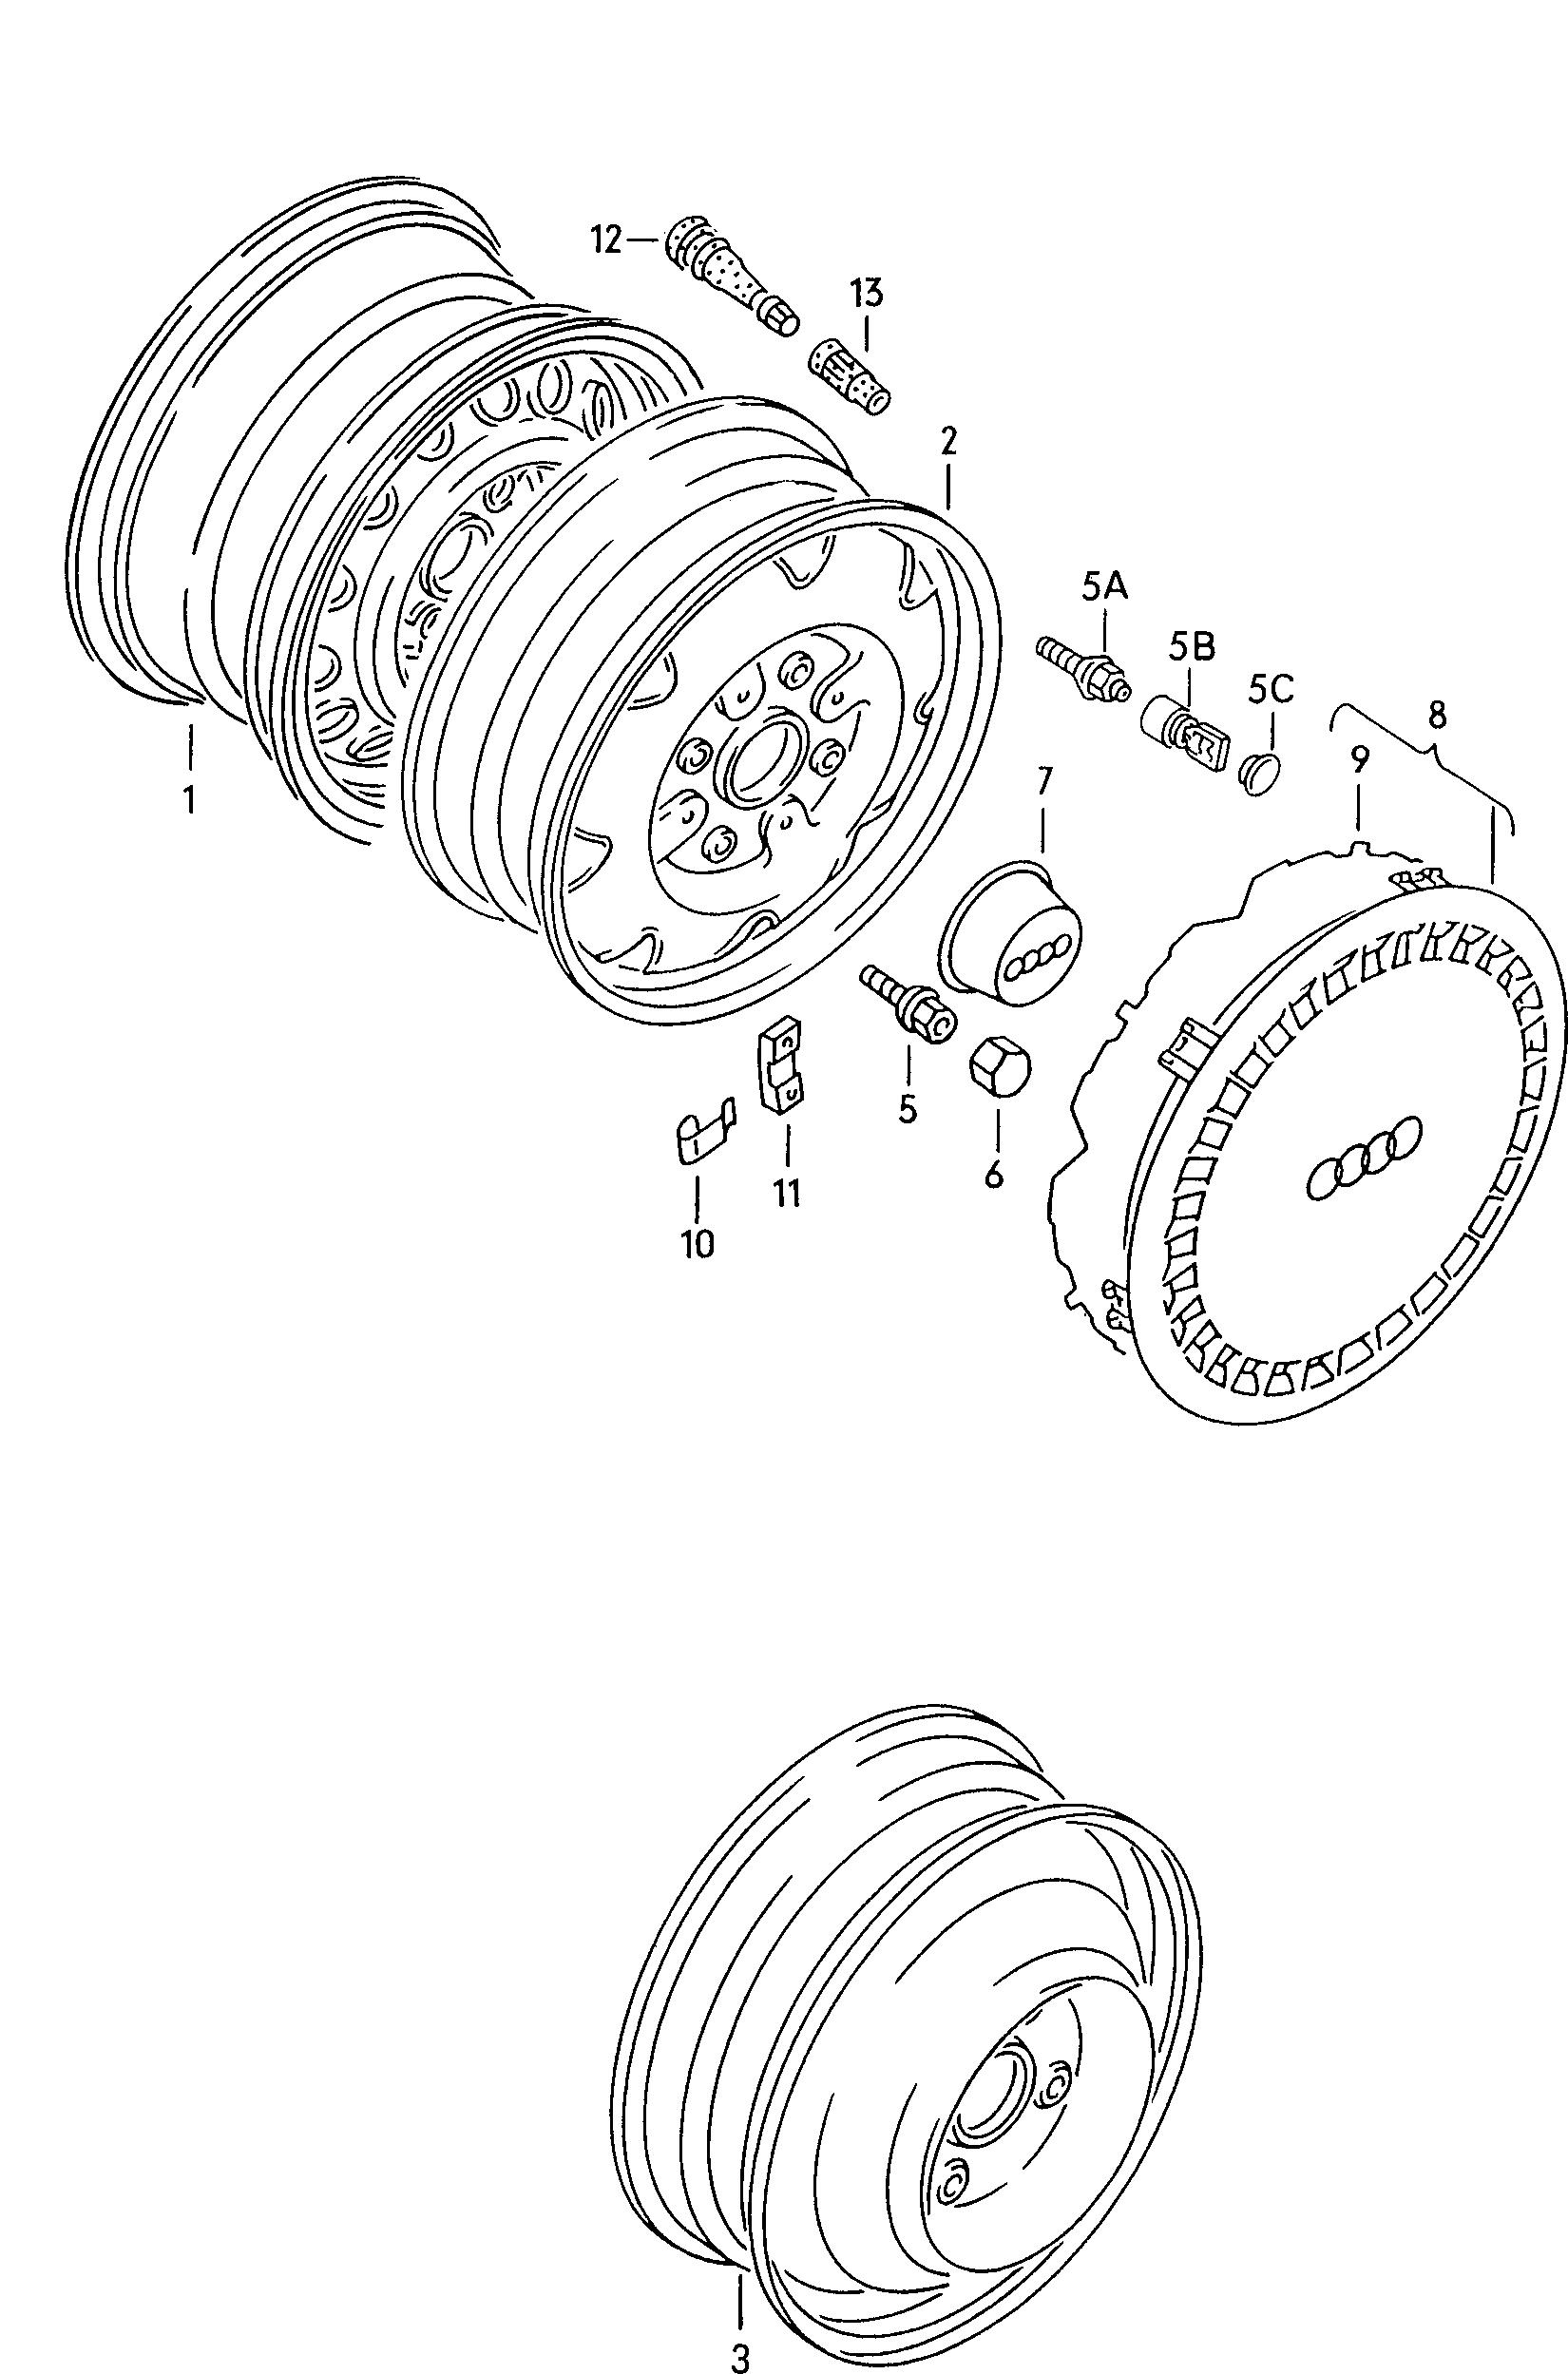 Audi Coupe Europe 1989 Wheels Brakes 60110 Wiring Diagram Parts